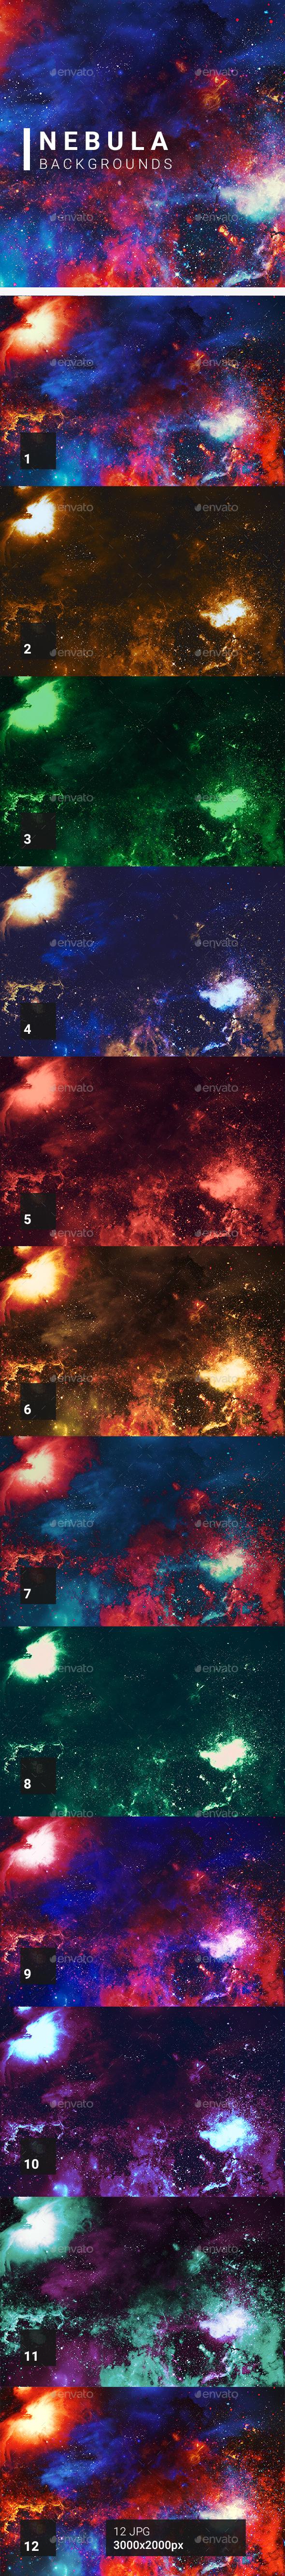 Nebula Backgrounds - Abstract Backgrounds